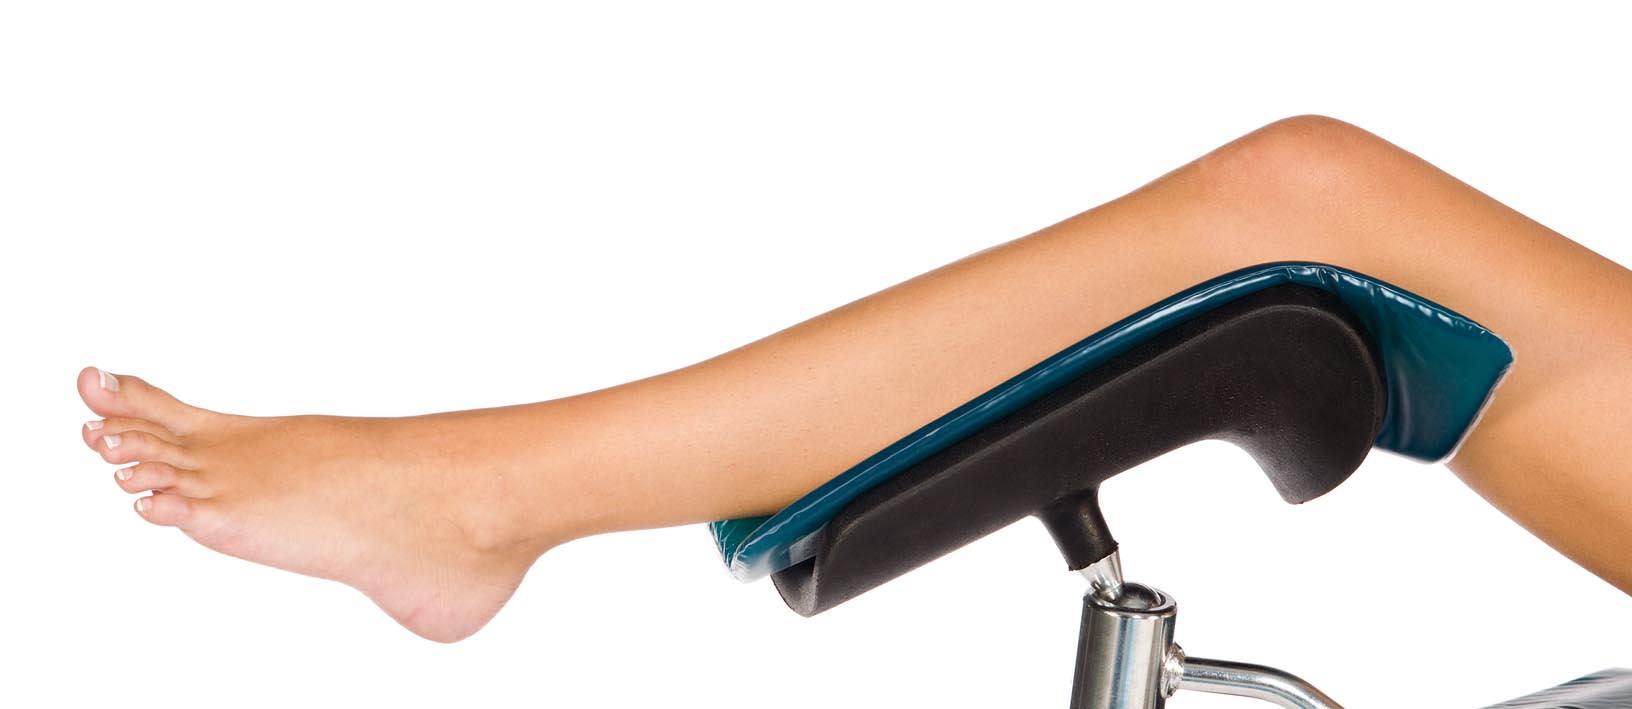 Oasis Crutch Stirrup Pad (OA091) - Adolescent / Adult - 395 x 245 x 10mm